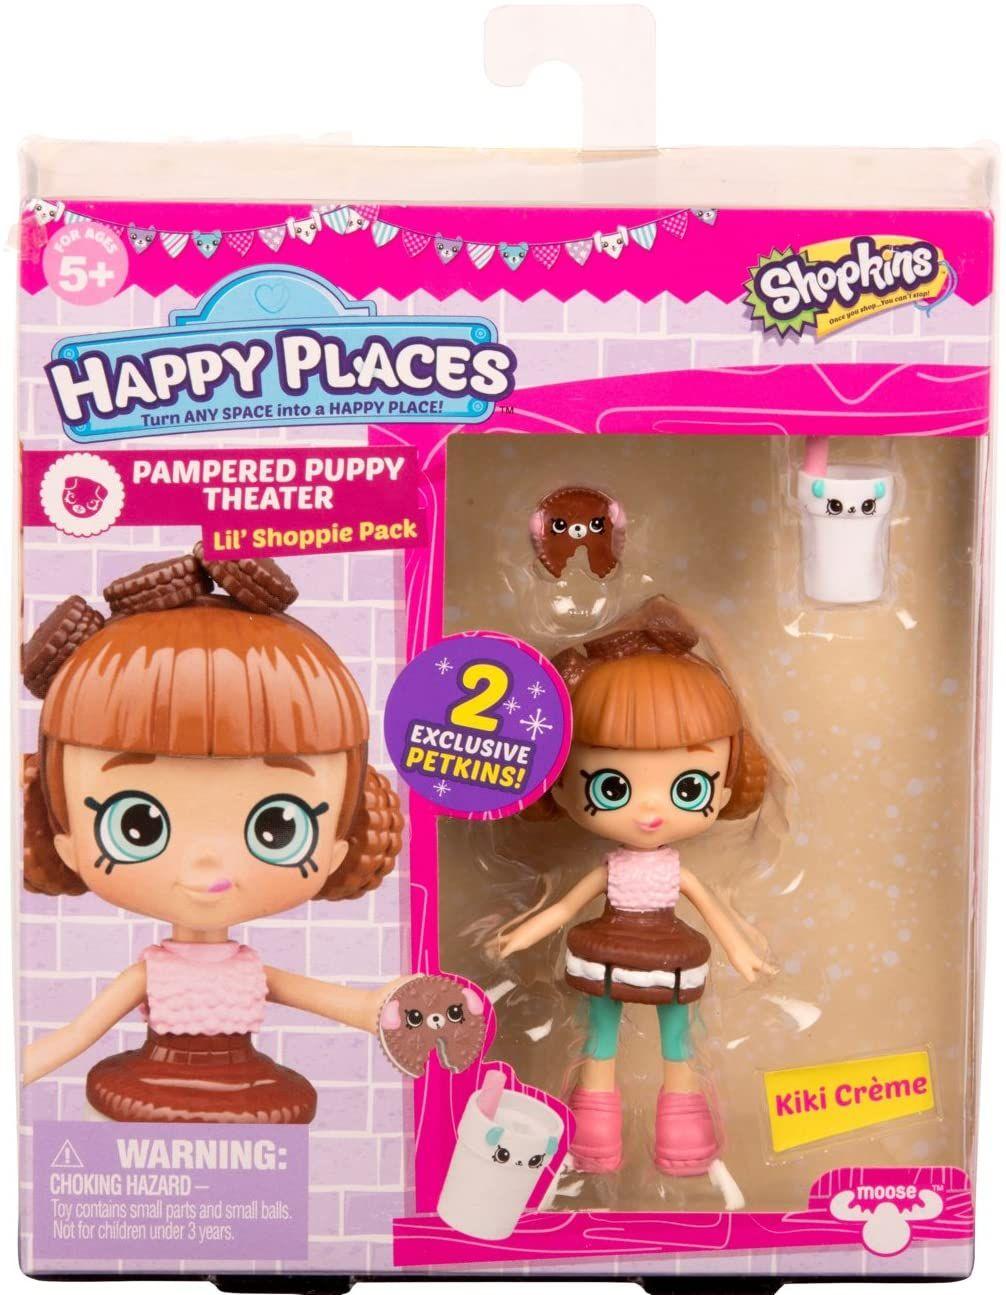 Фигурка Shopkins Happy Places - Kiki Crеme, Серия 3 - 1